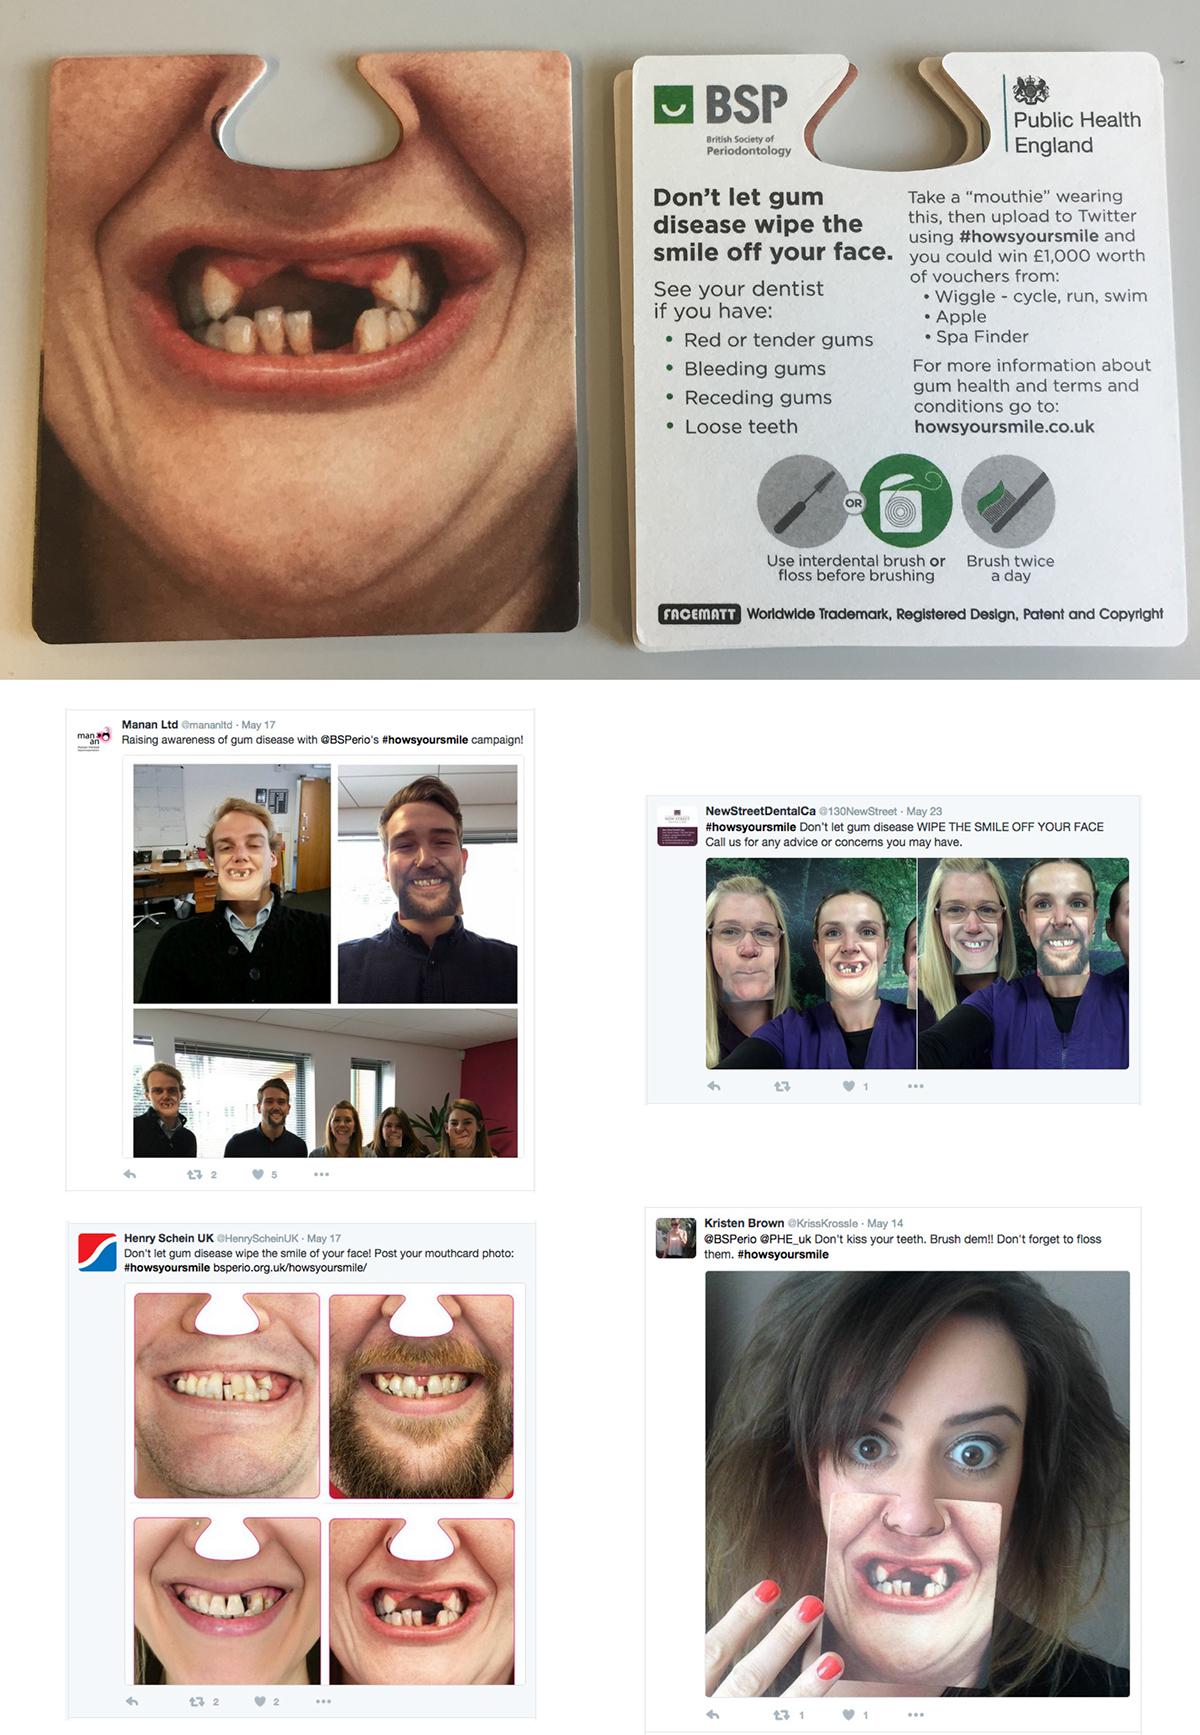 gum disease bsp dentist facemat smile Disease awareness online offline campaign